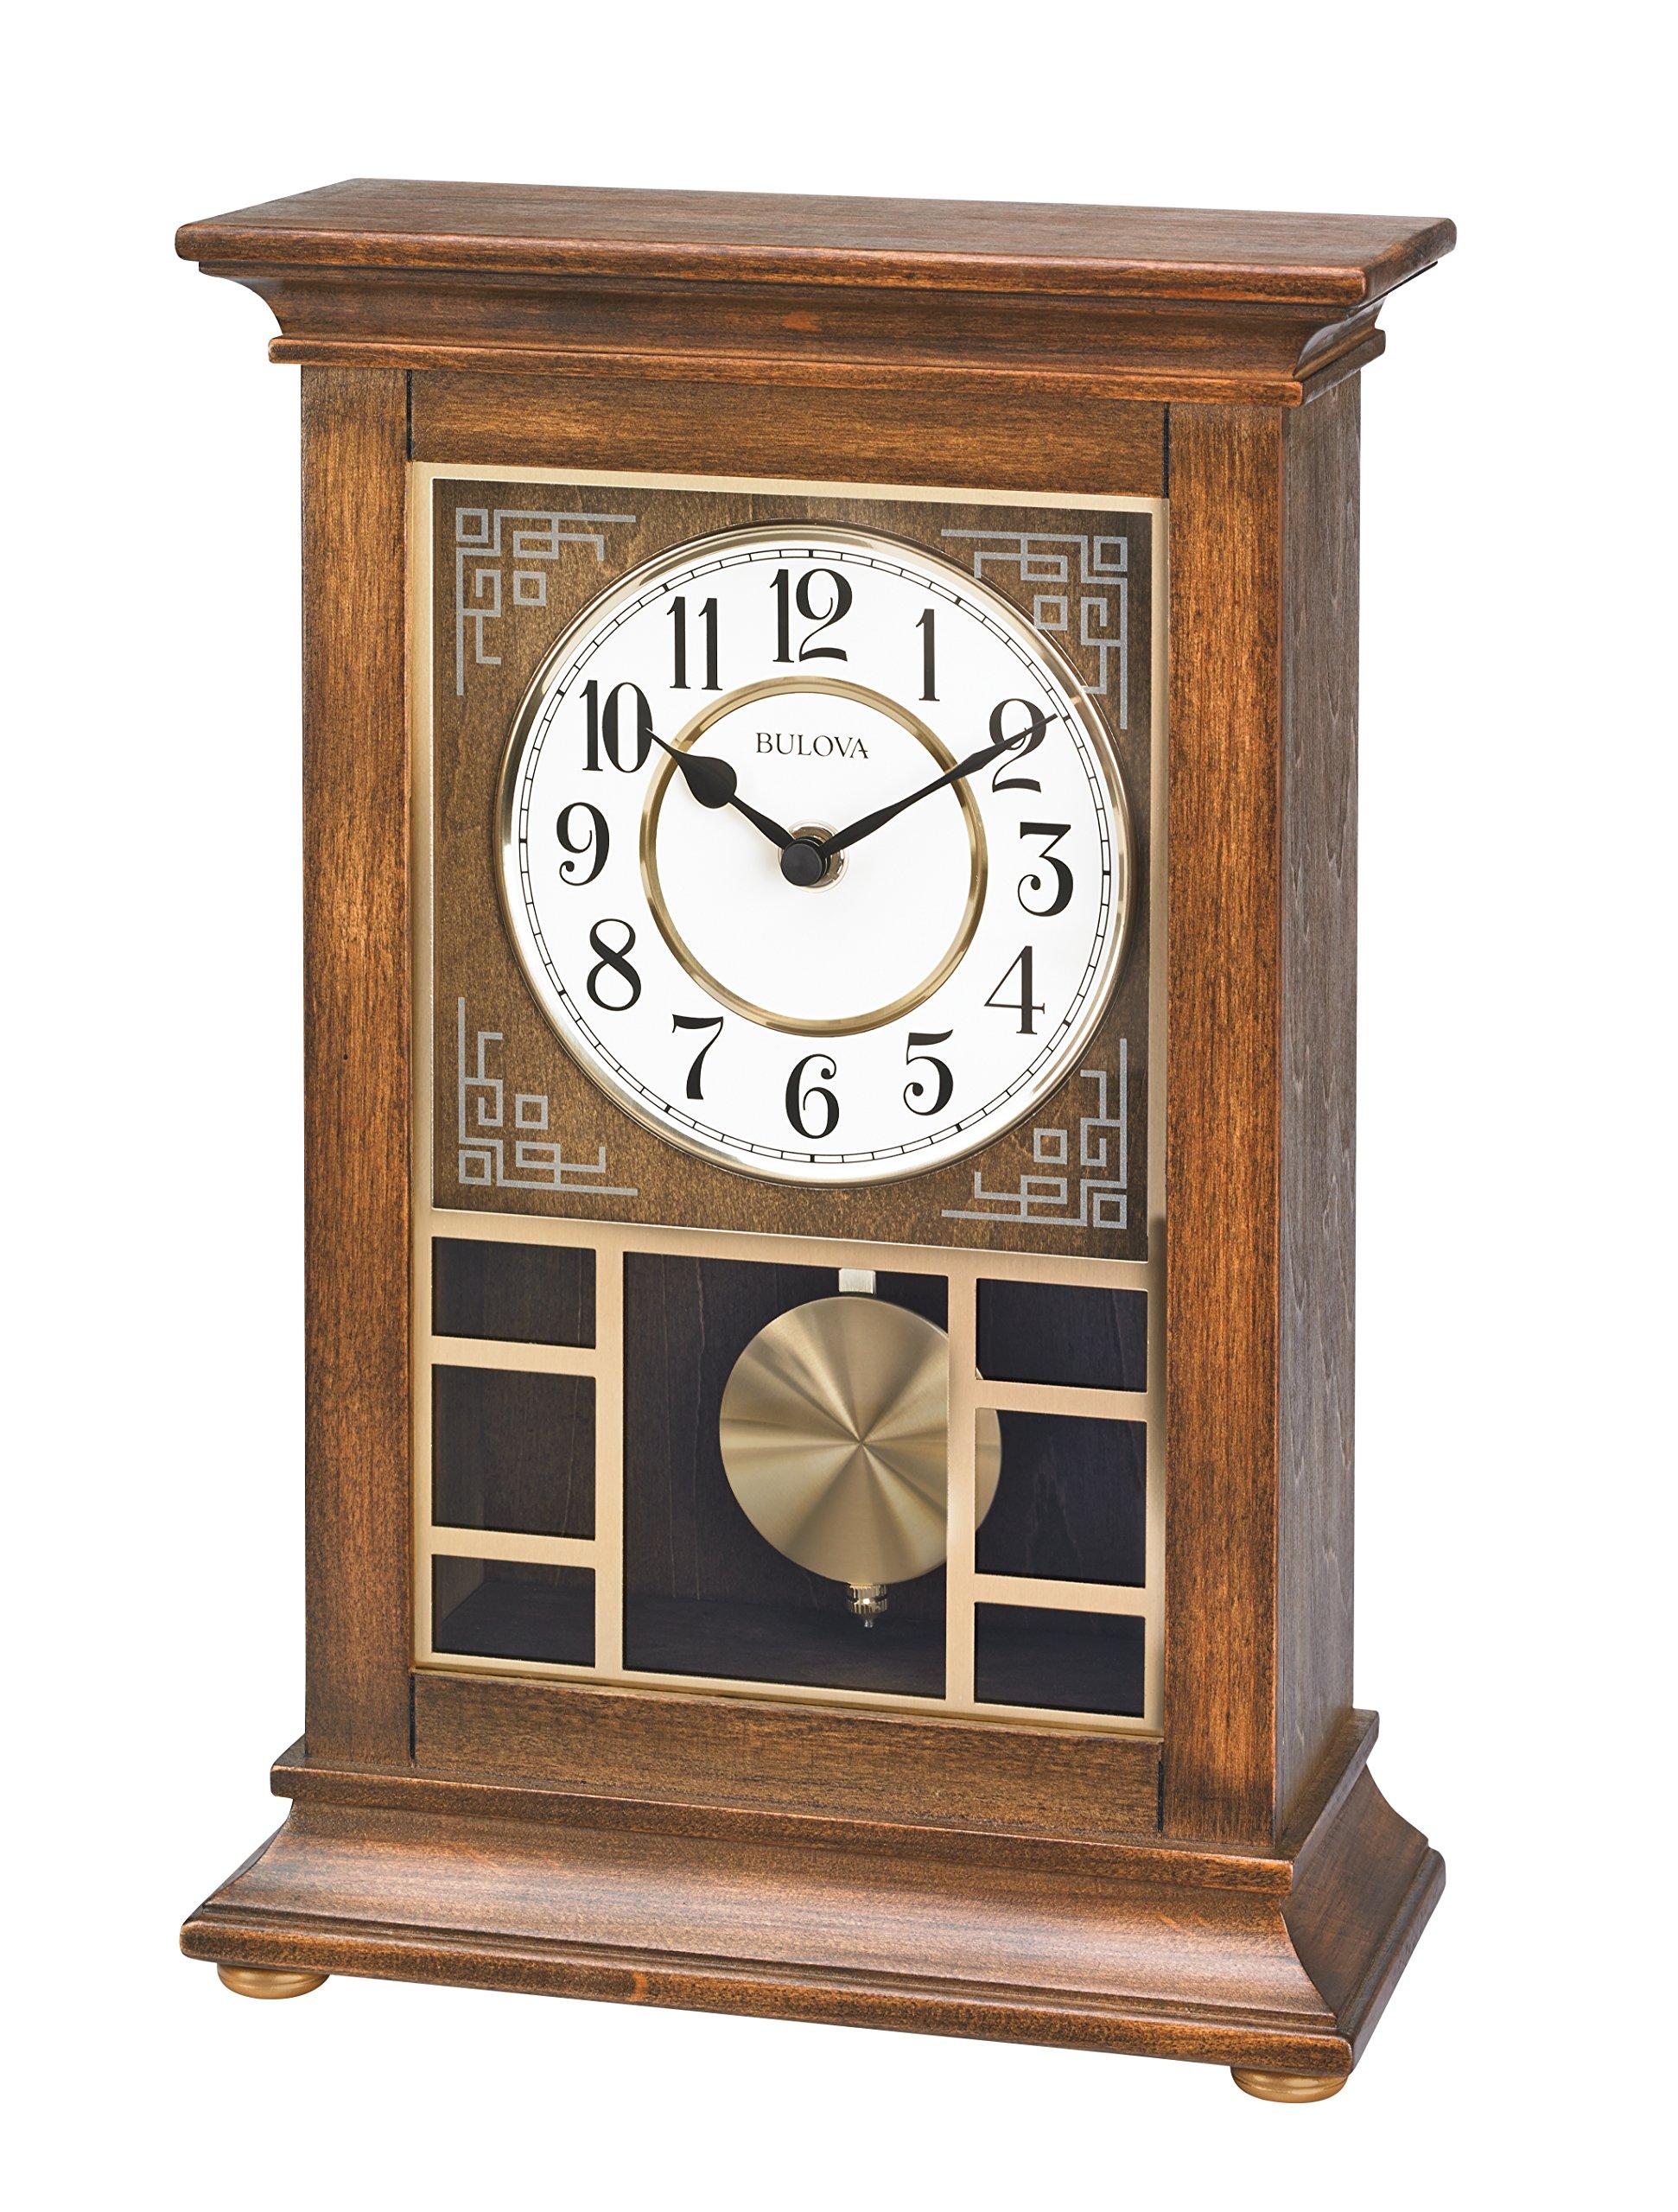 Bulova Stratford Mantel Chime Clock - B1654 by Bulova